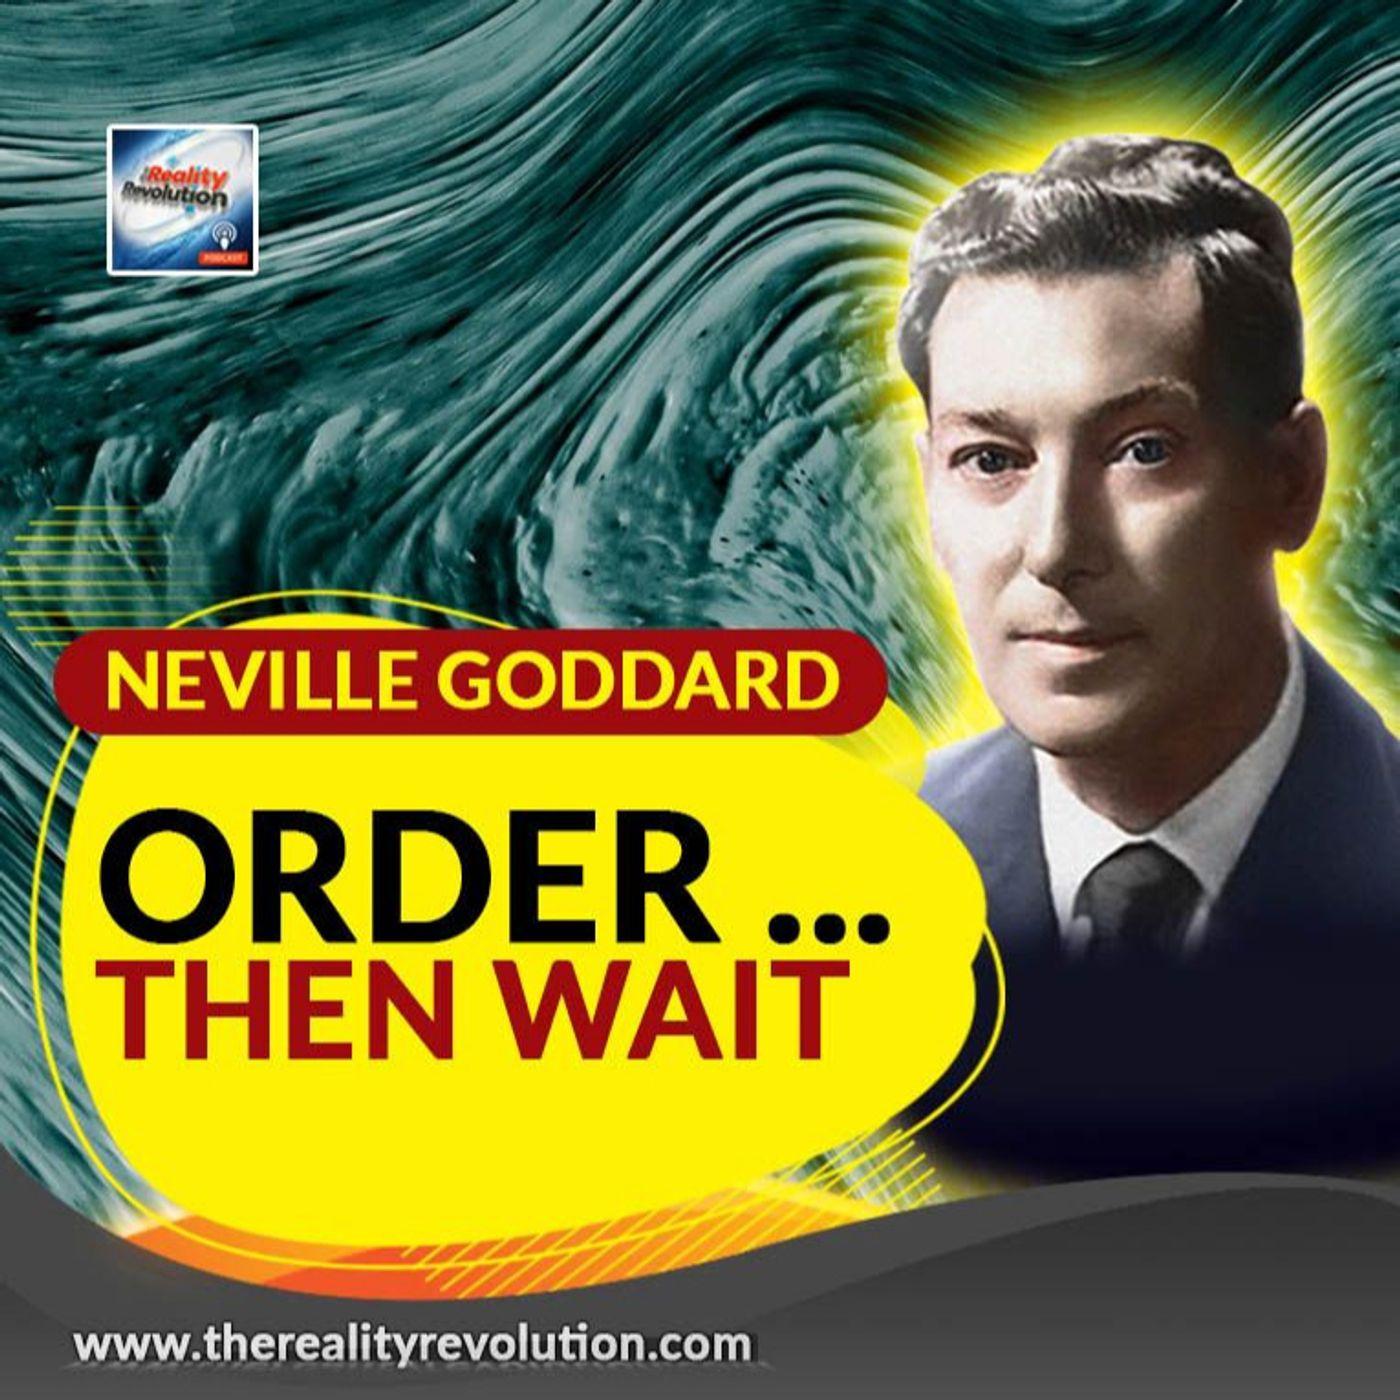 Neville Goddard Order Then Wait